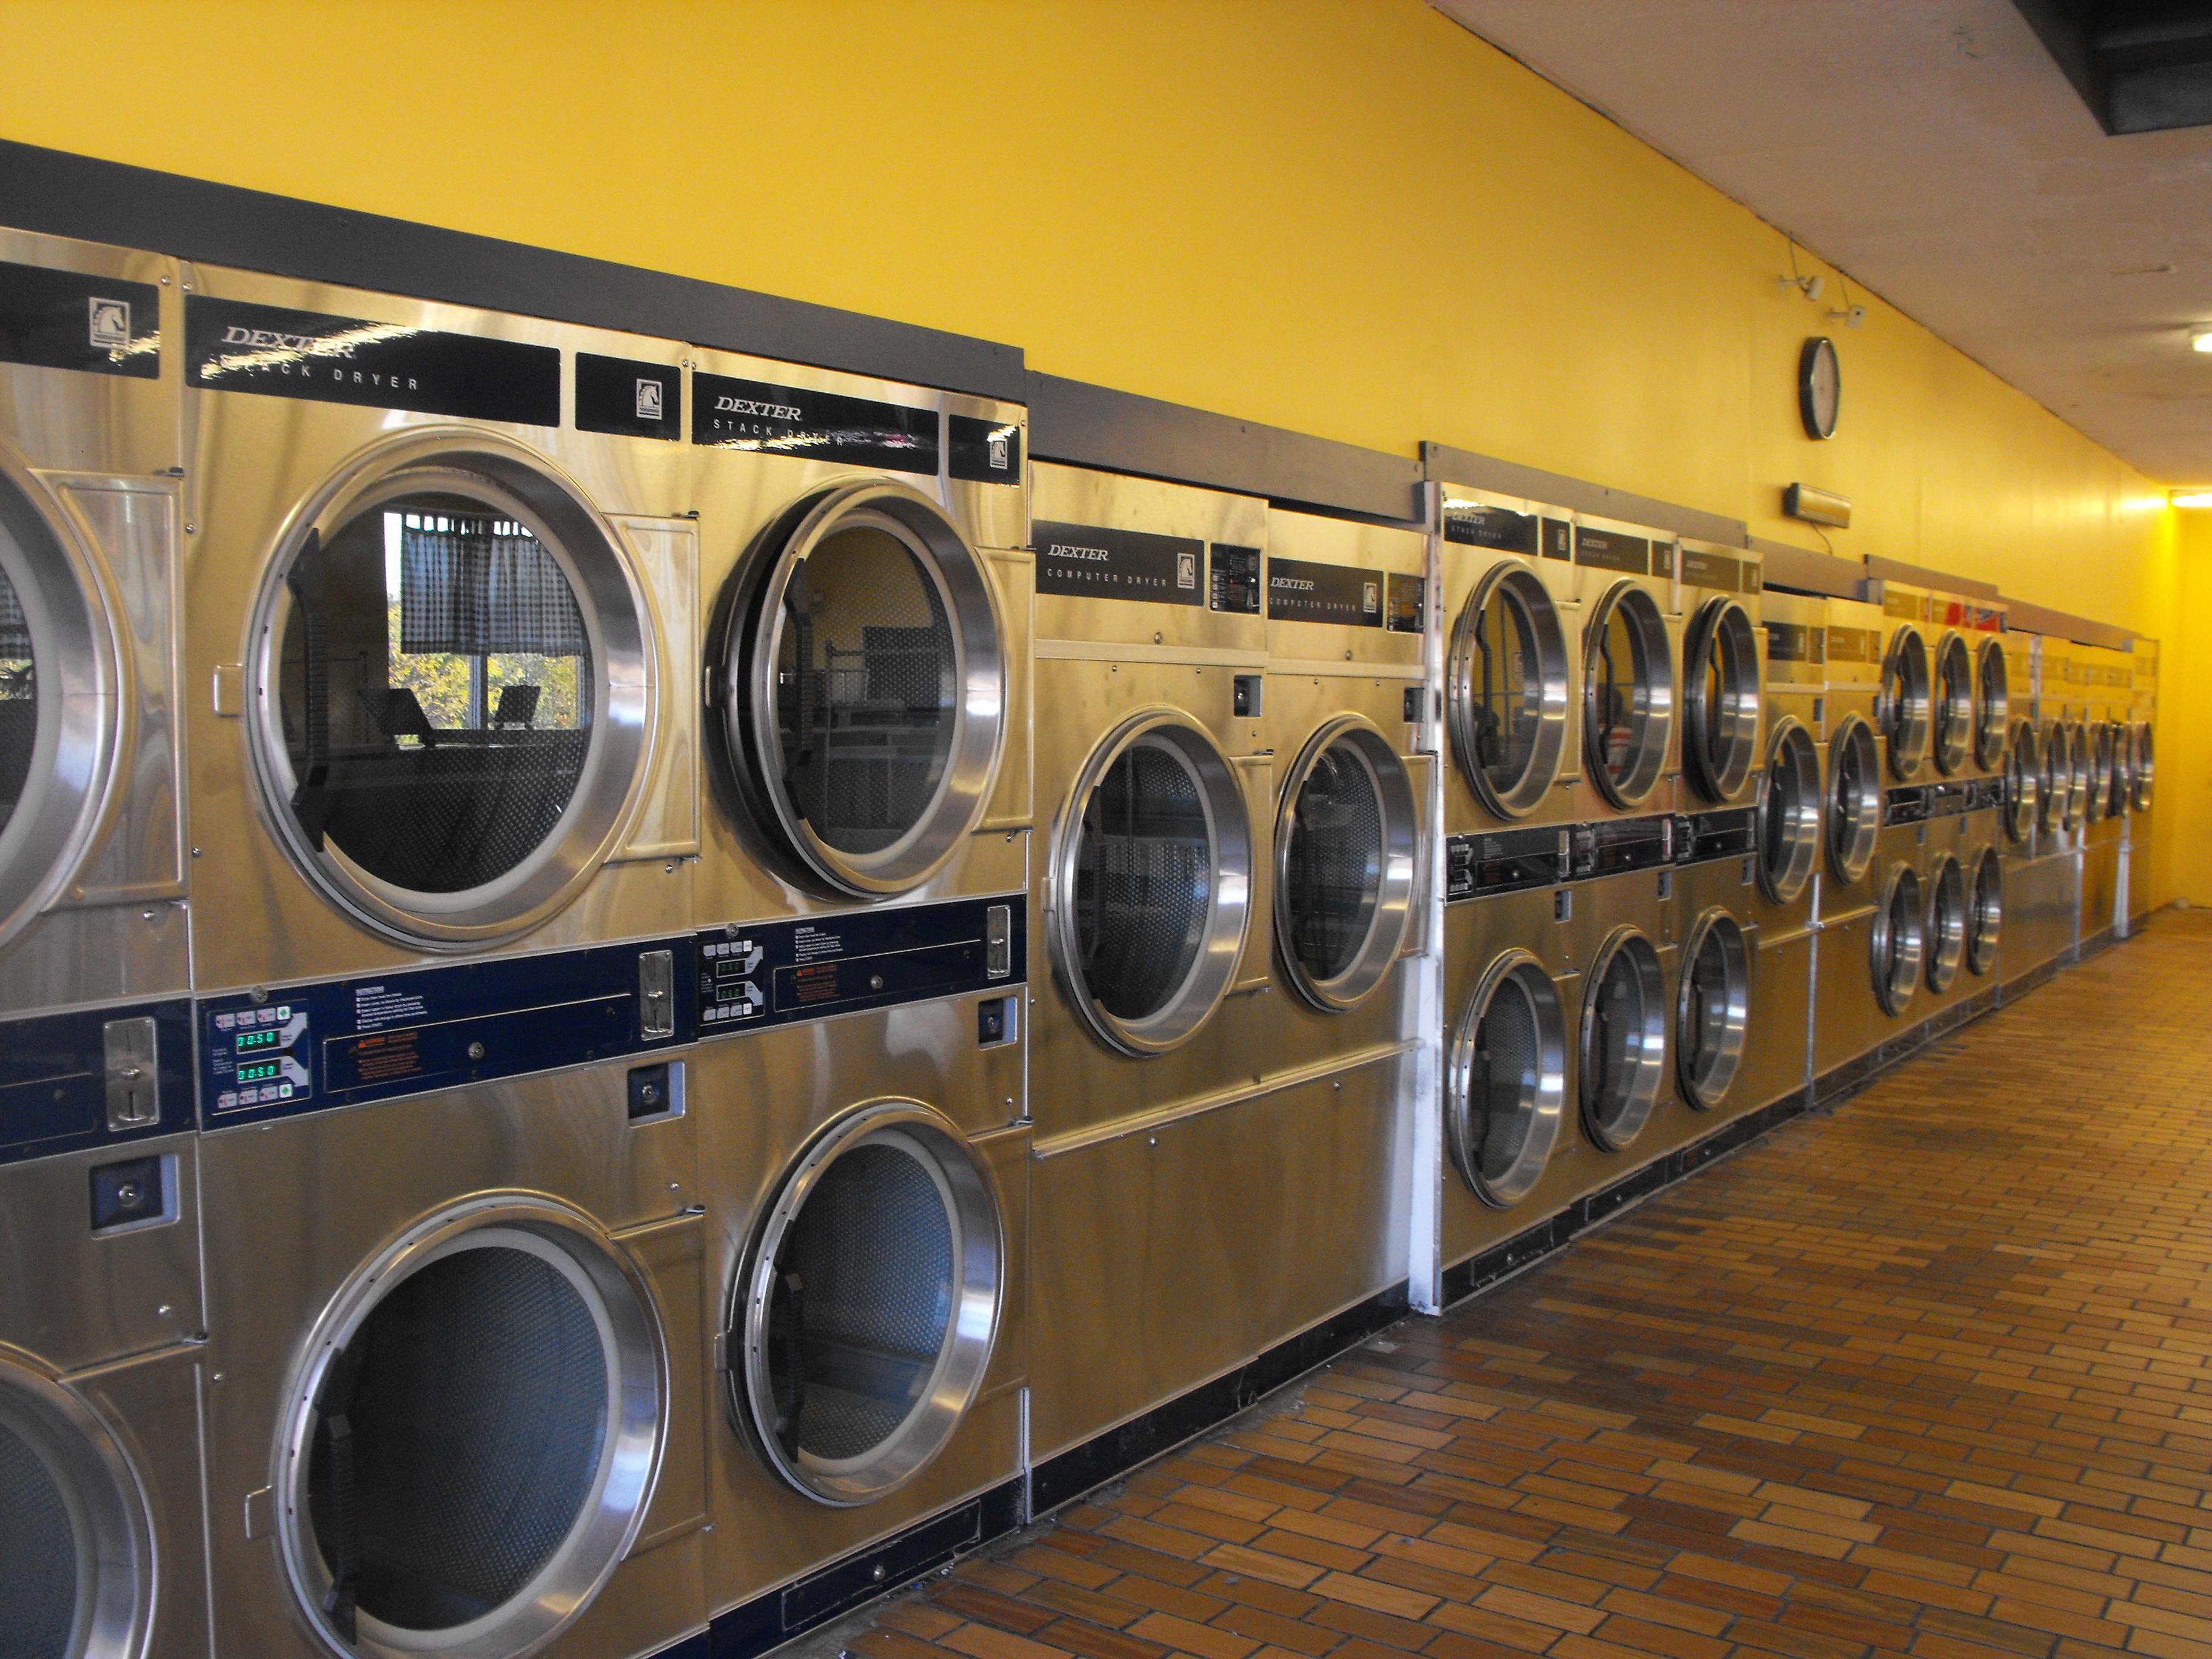 Vandalia Coin Laundry and Car Wash image 4